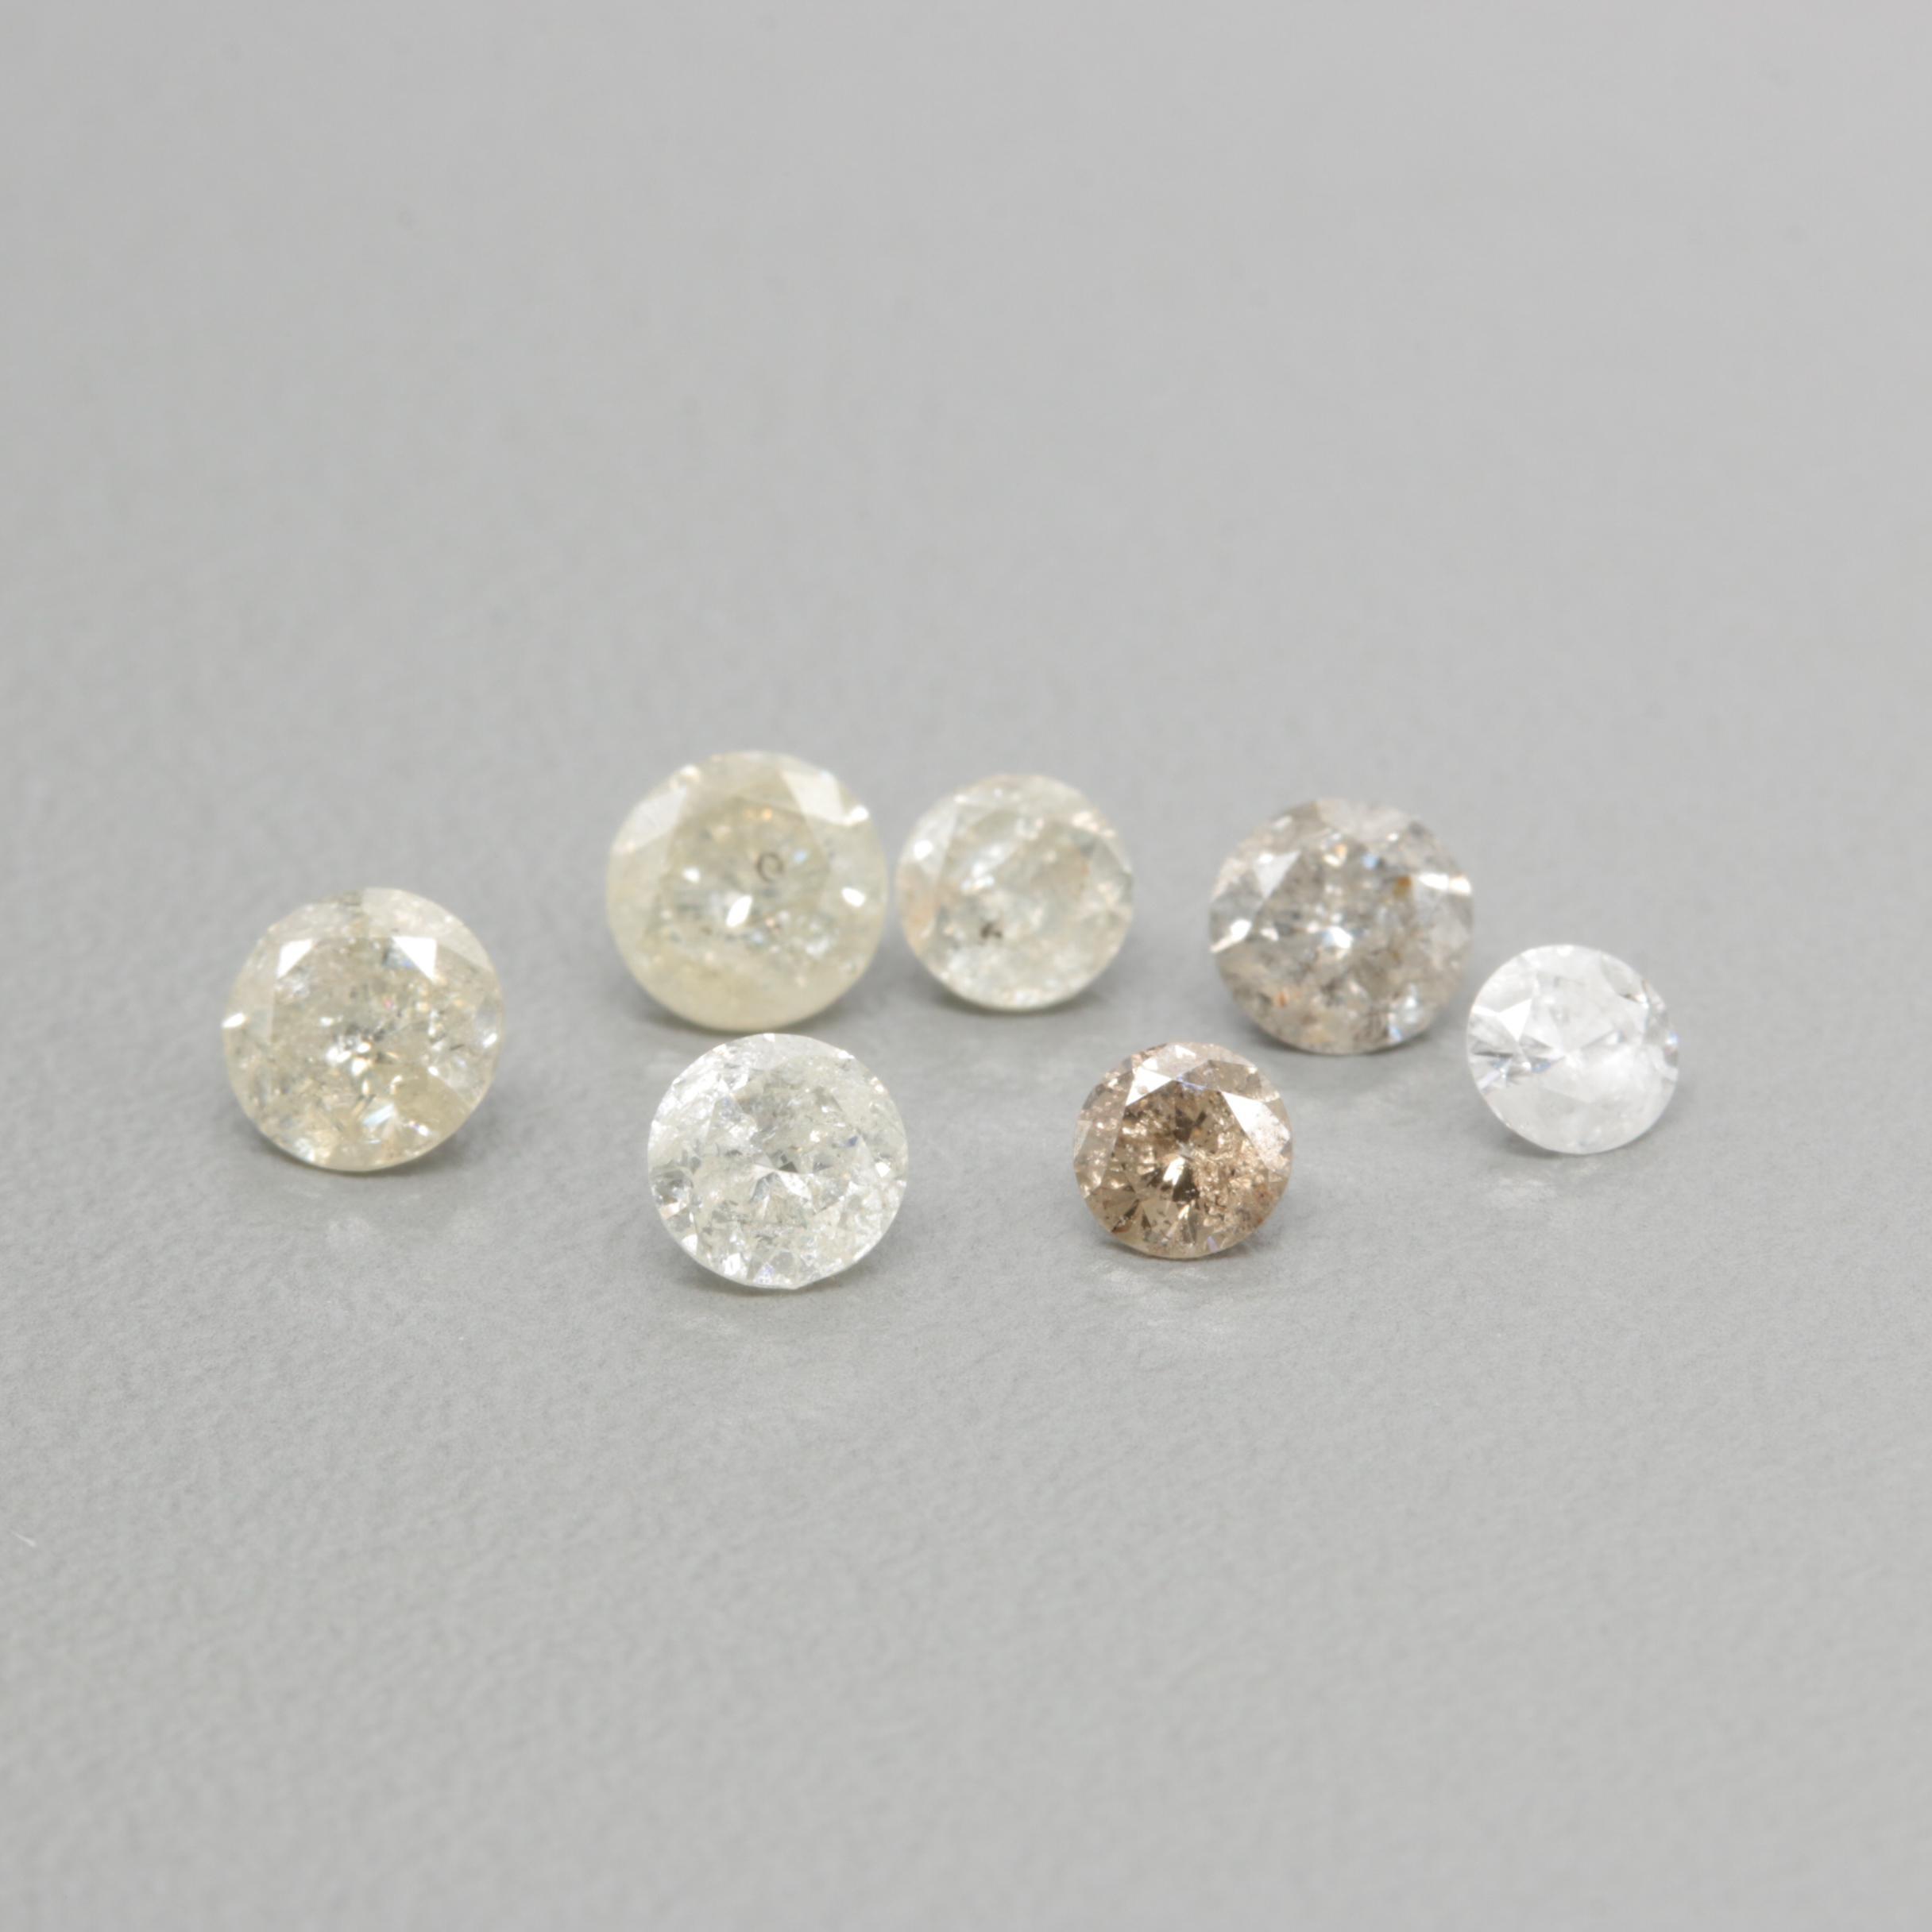 Loose 2.16 CTW Diamond Assortment